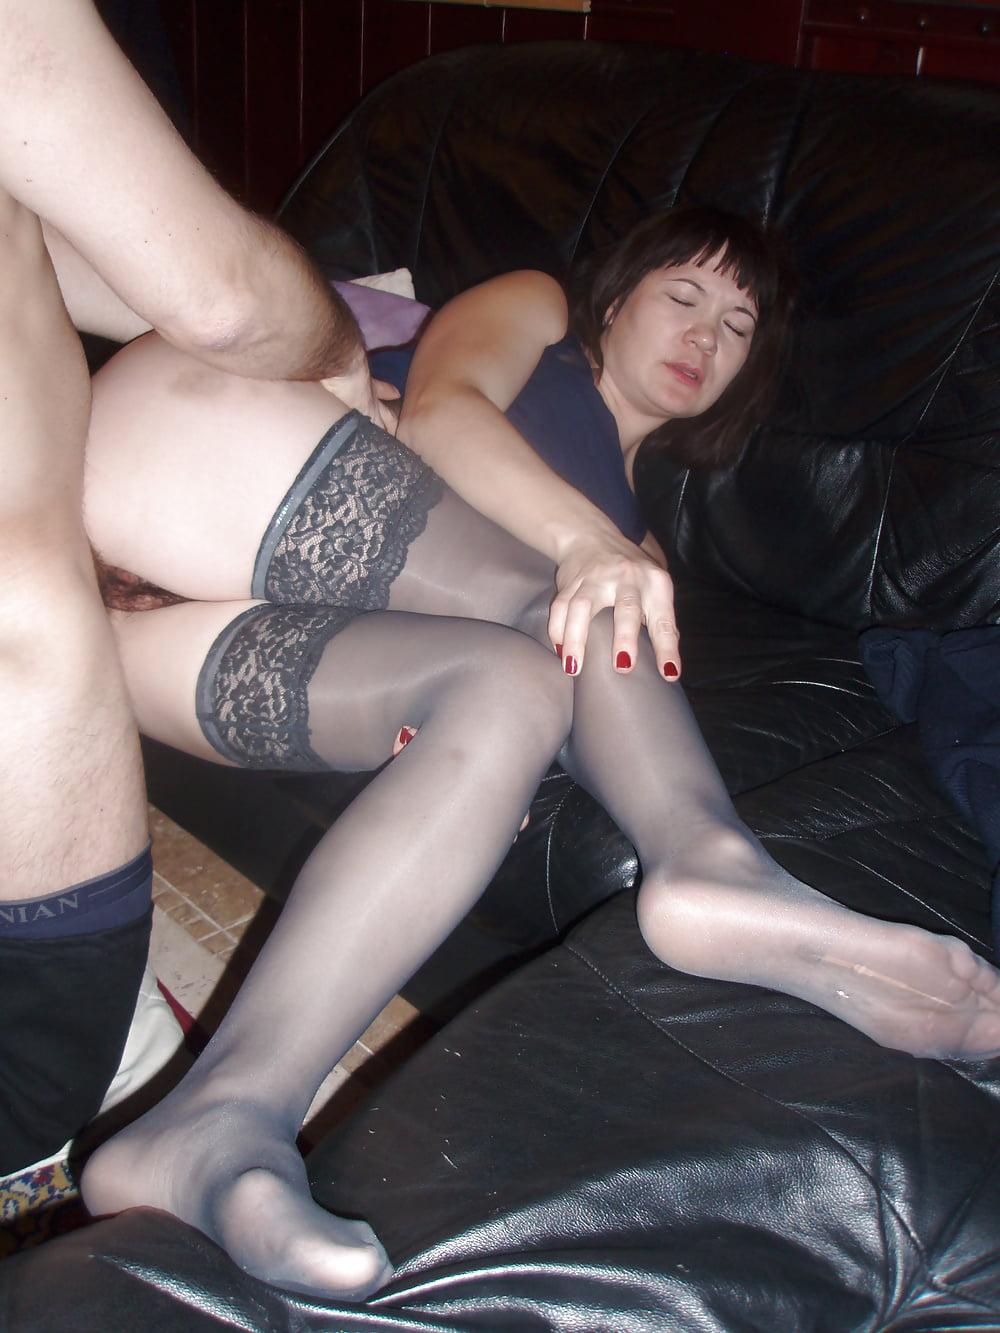 Порно русская жена пошла по рукам — pic 1